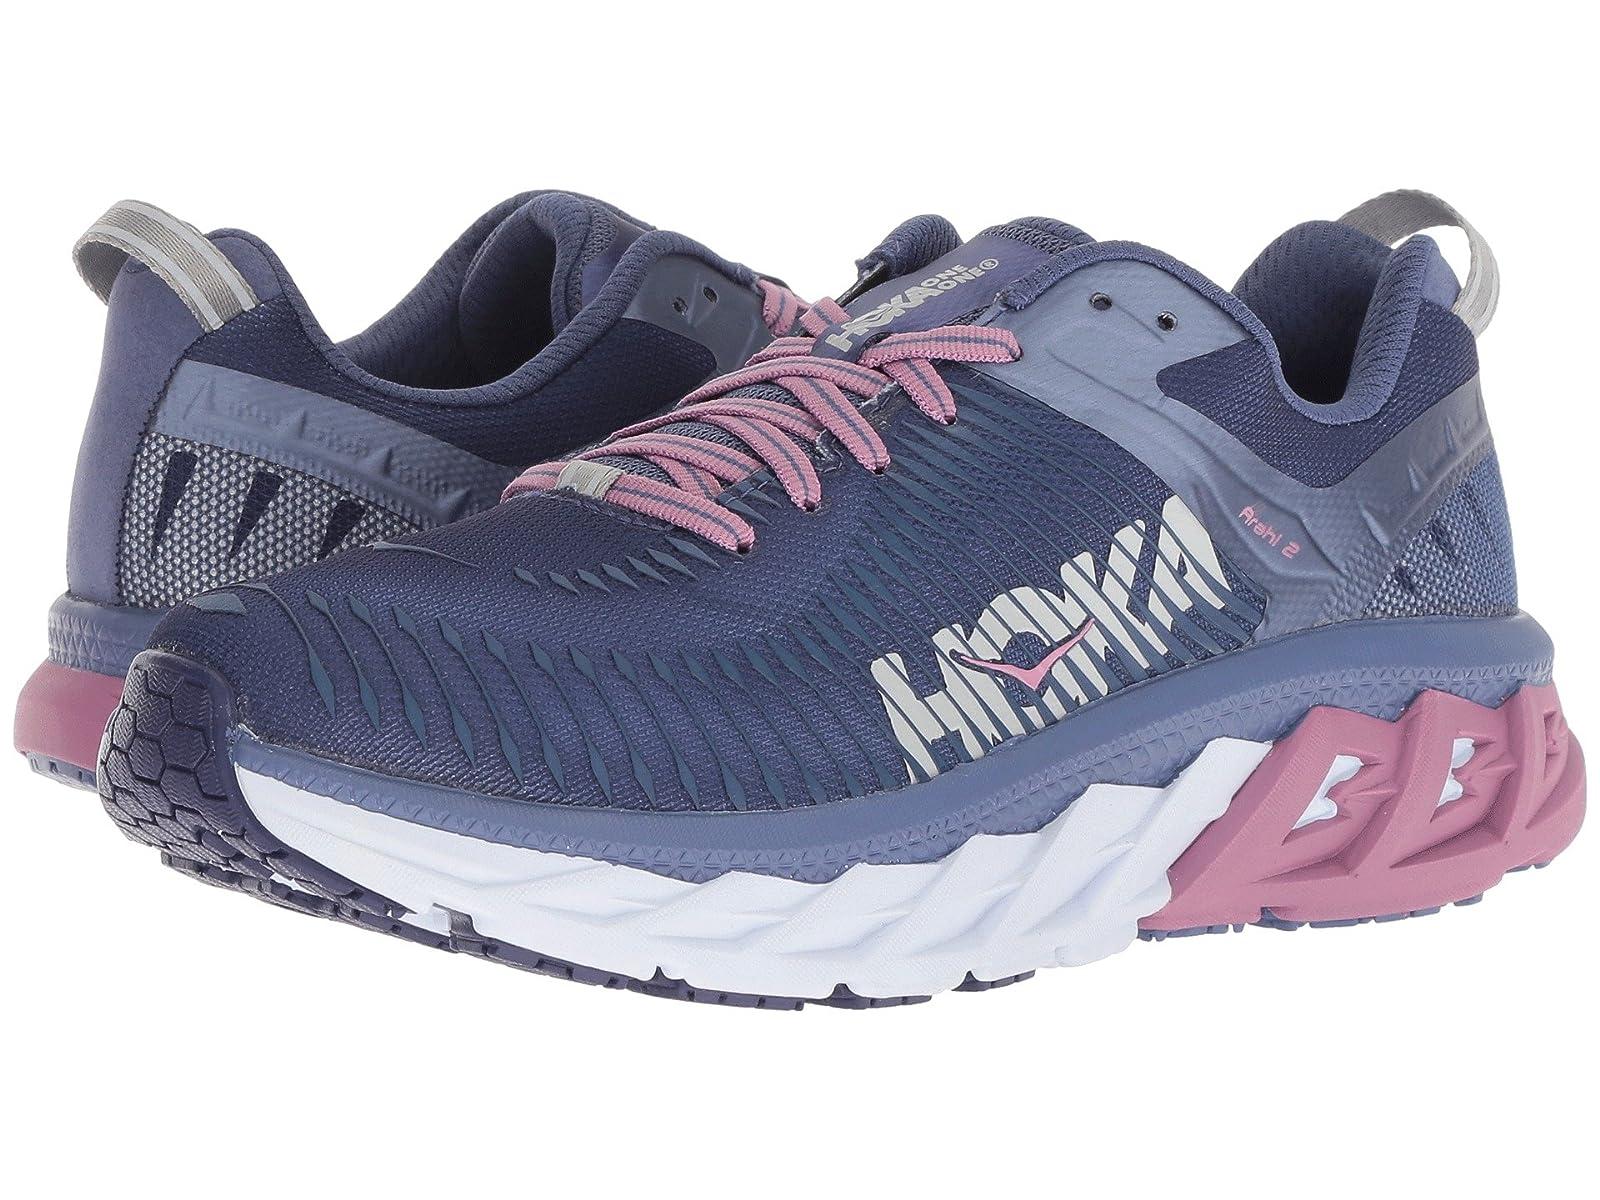 Hoka One One Arahi 2Atmospheric grades have affordable shoes